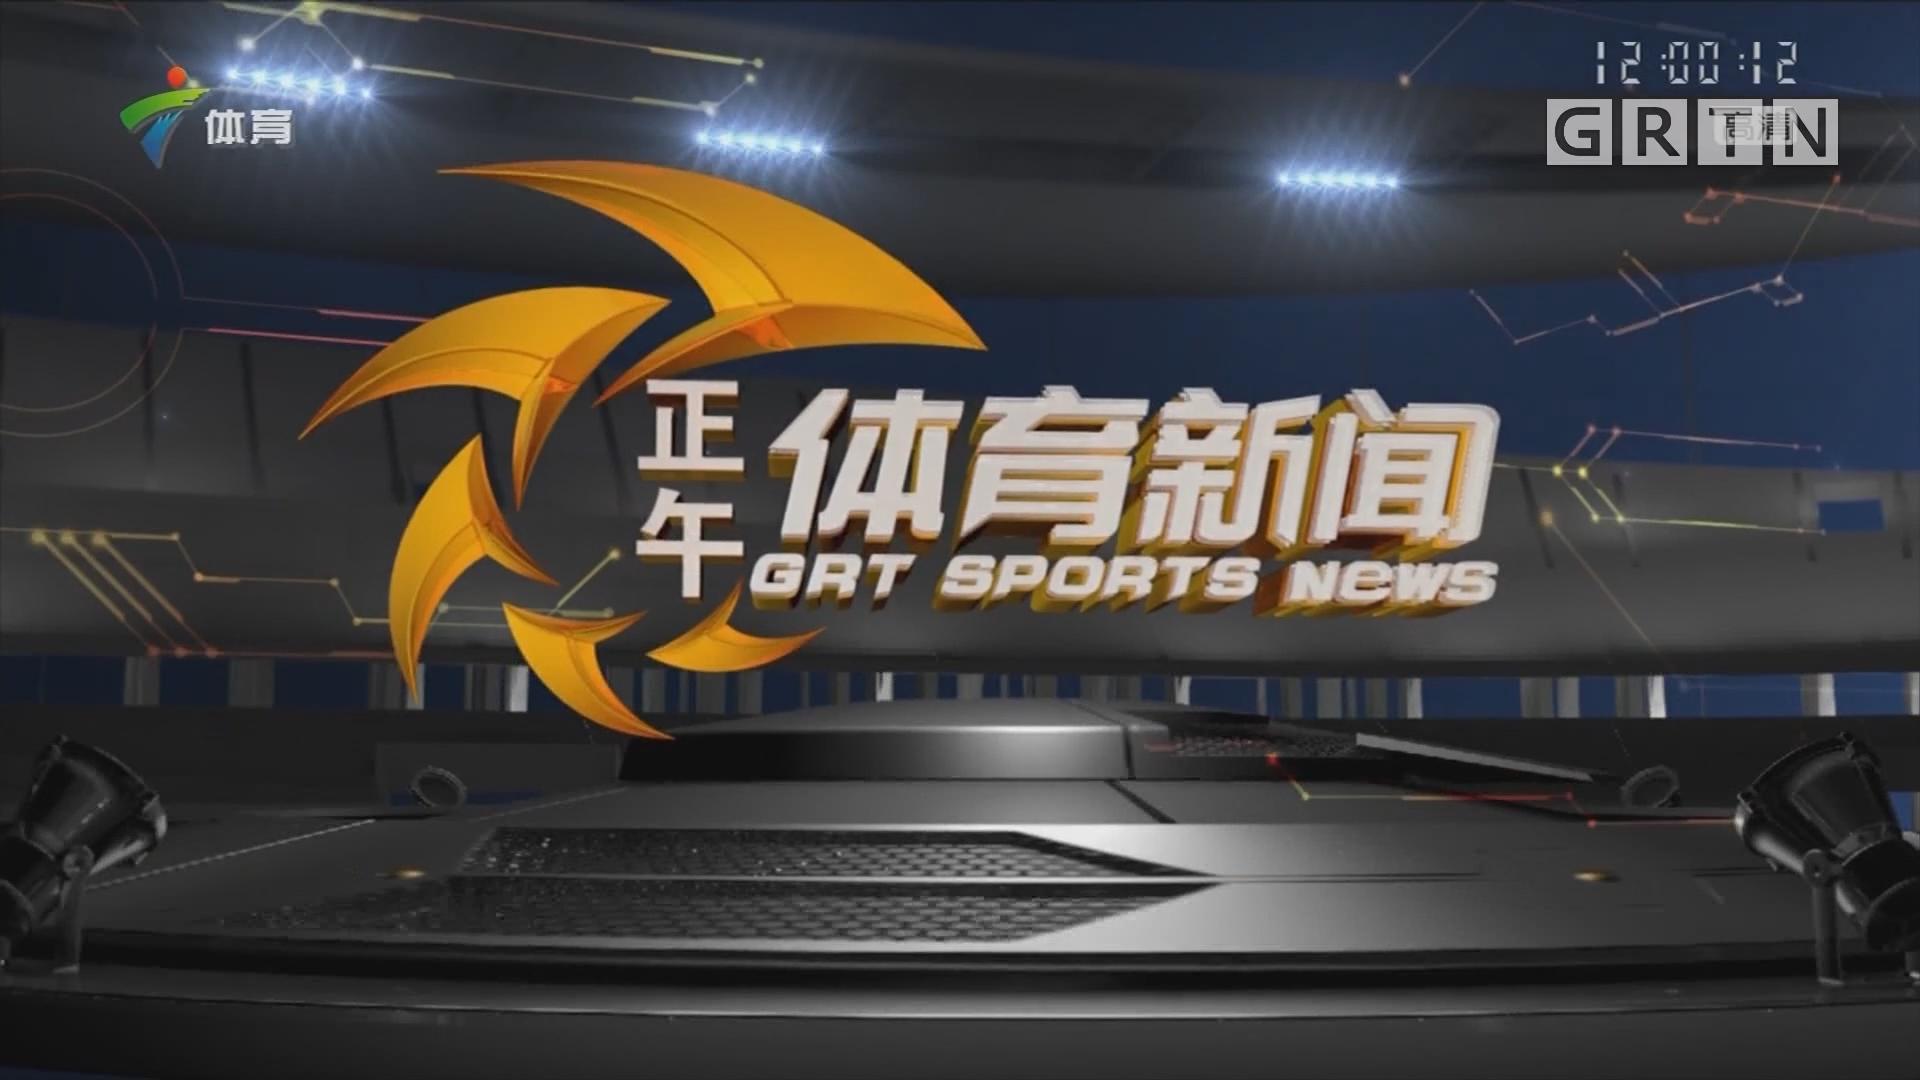 [HD][2019-10-19]正午体育新闻:第七届世界军人运动会在武汉隆重开幕 习近平出席开幕式并宣布运动会开幕